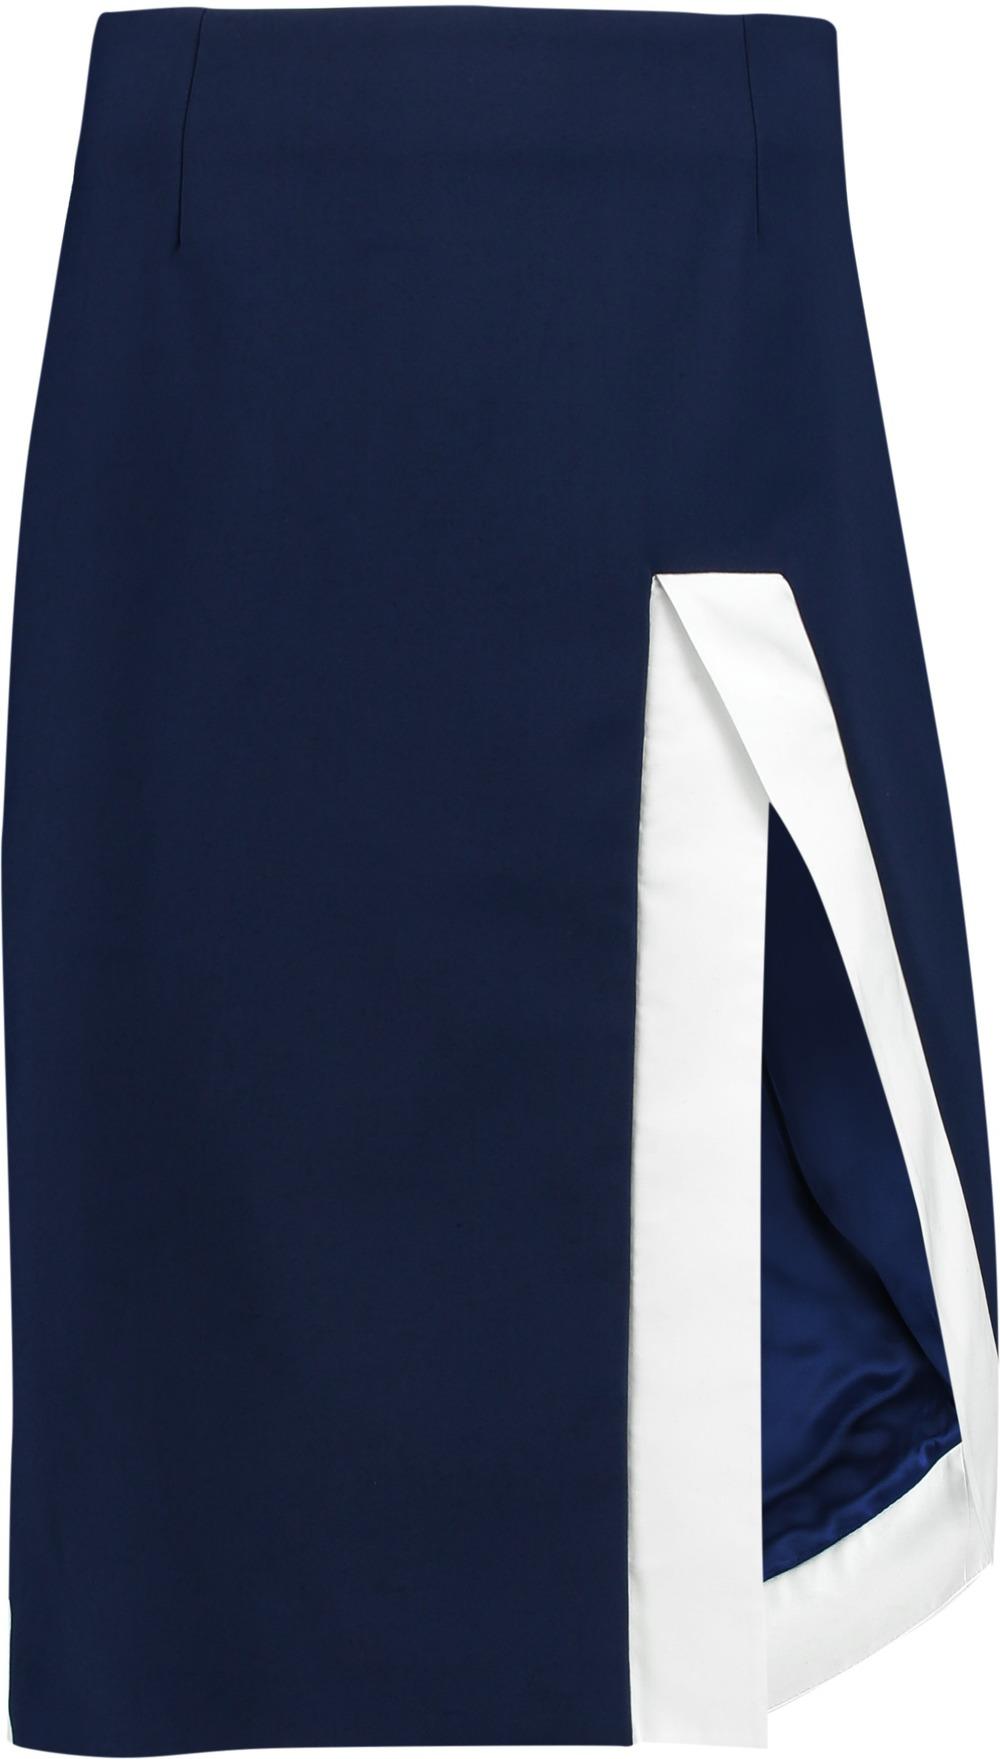 472666_J.W.Anderson_Poplin-trimmed wool-blend skirt_THEOUTNET.COM.jpg